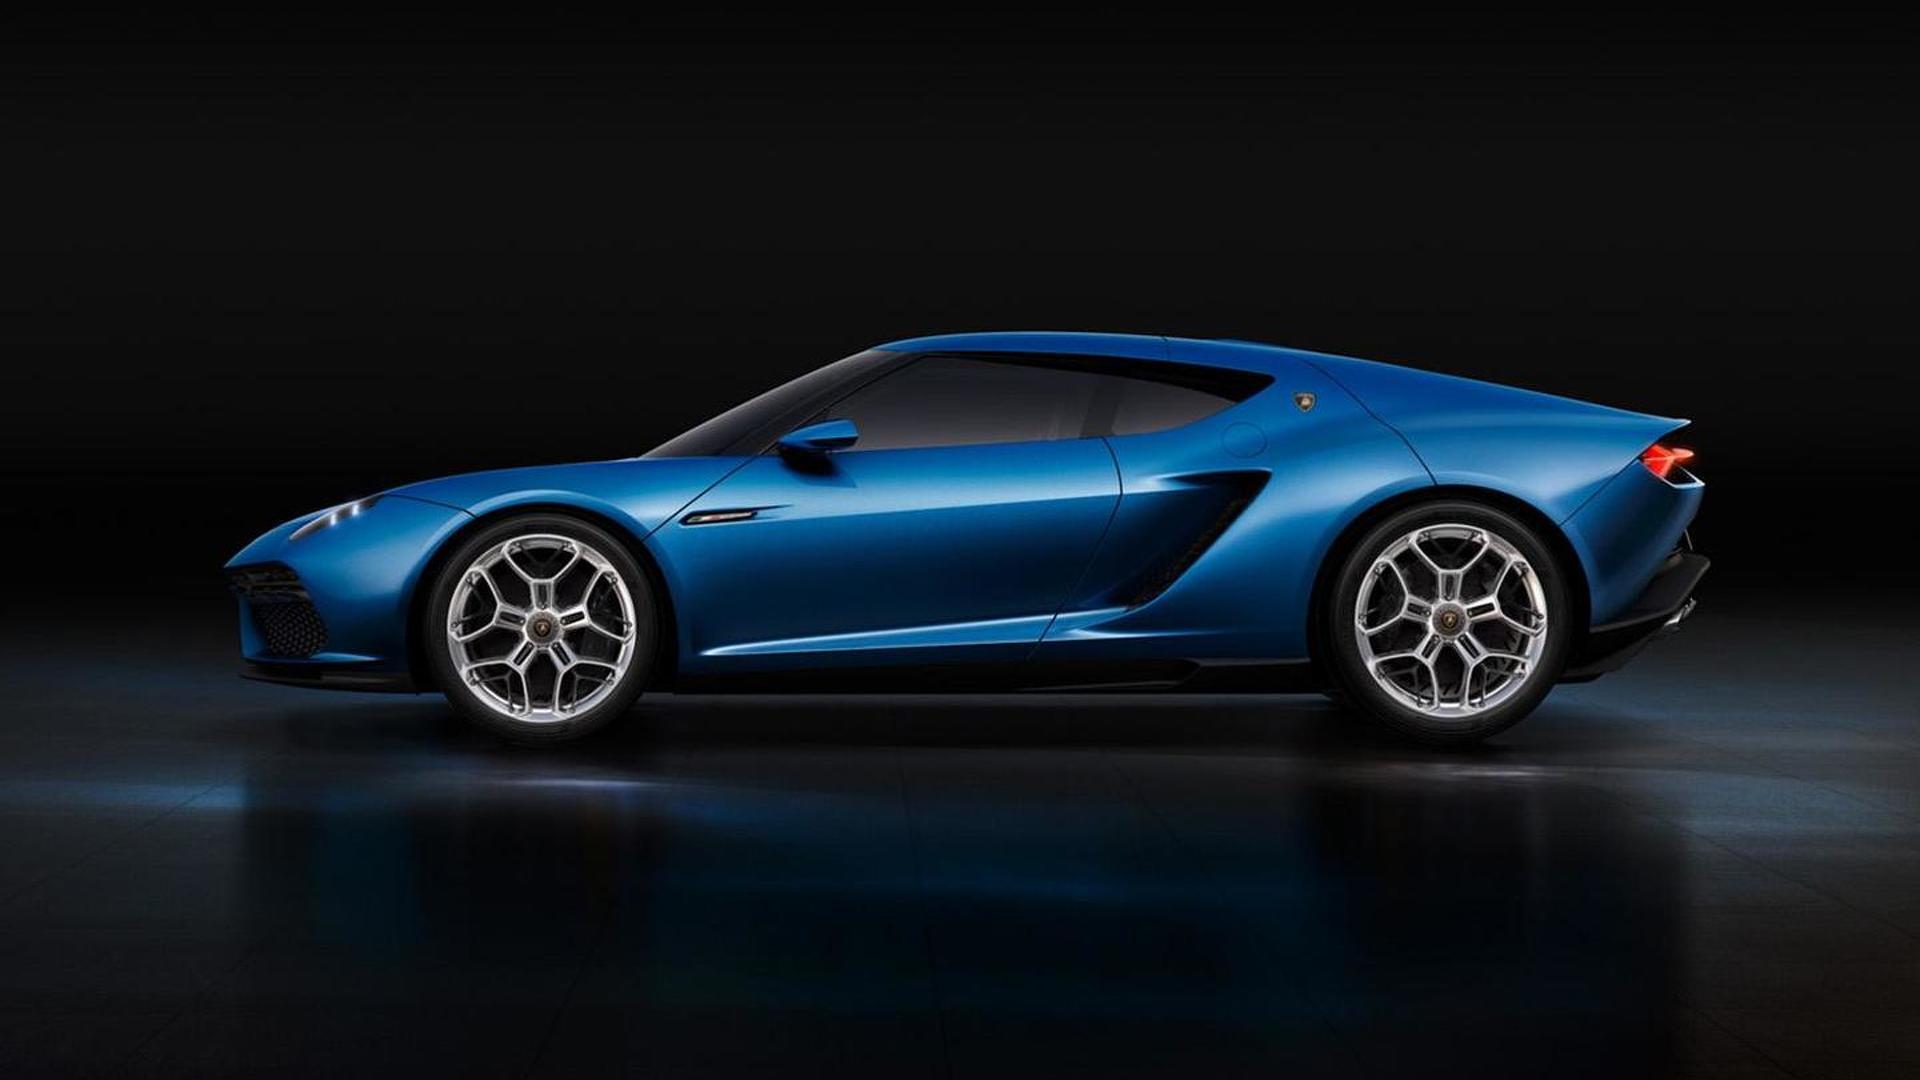 2014 Lamborghini Asterion LPI910-4